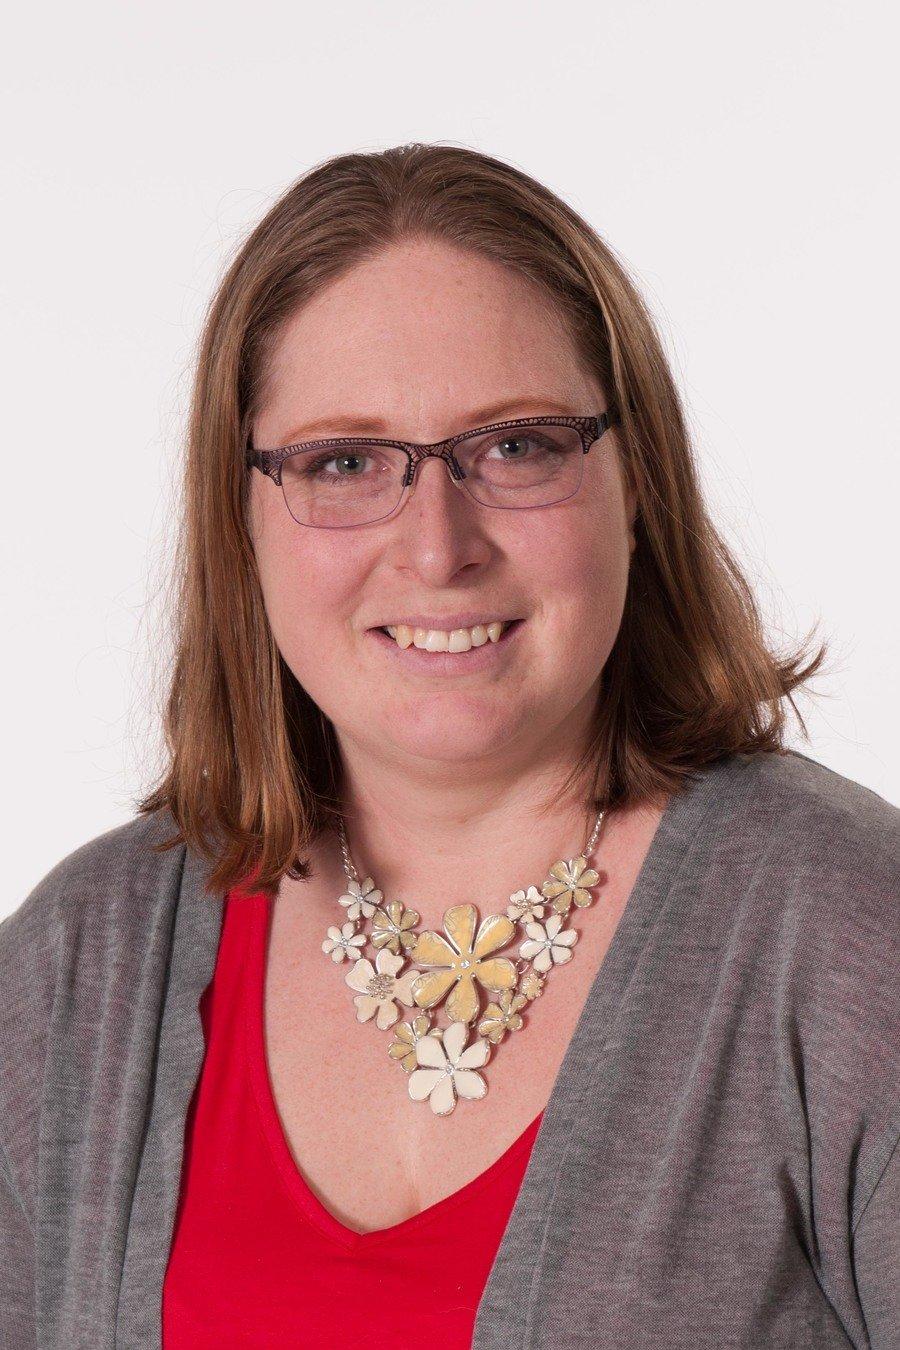 Kiri Stammers; BSc (Hons), QTS: Hawthorn Class Teacher, Year 4 Lead